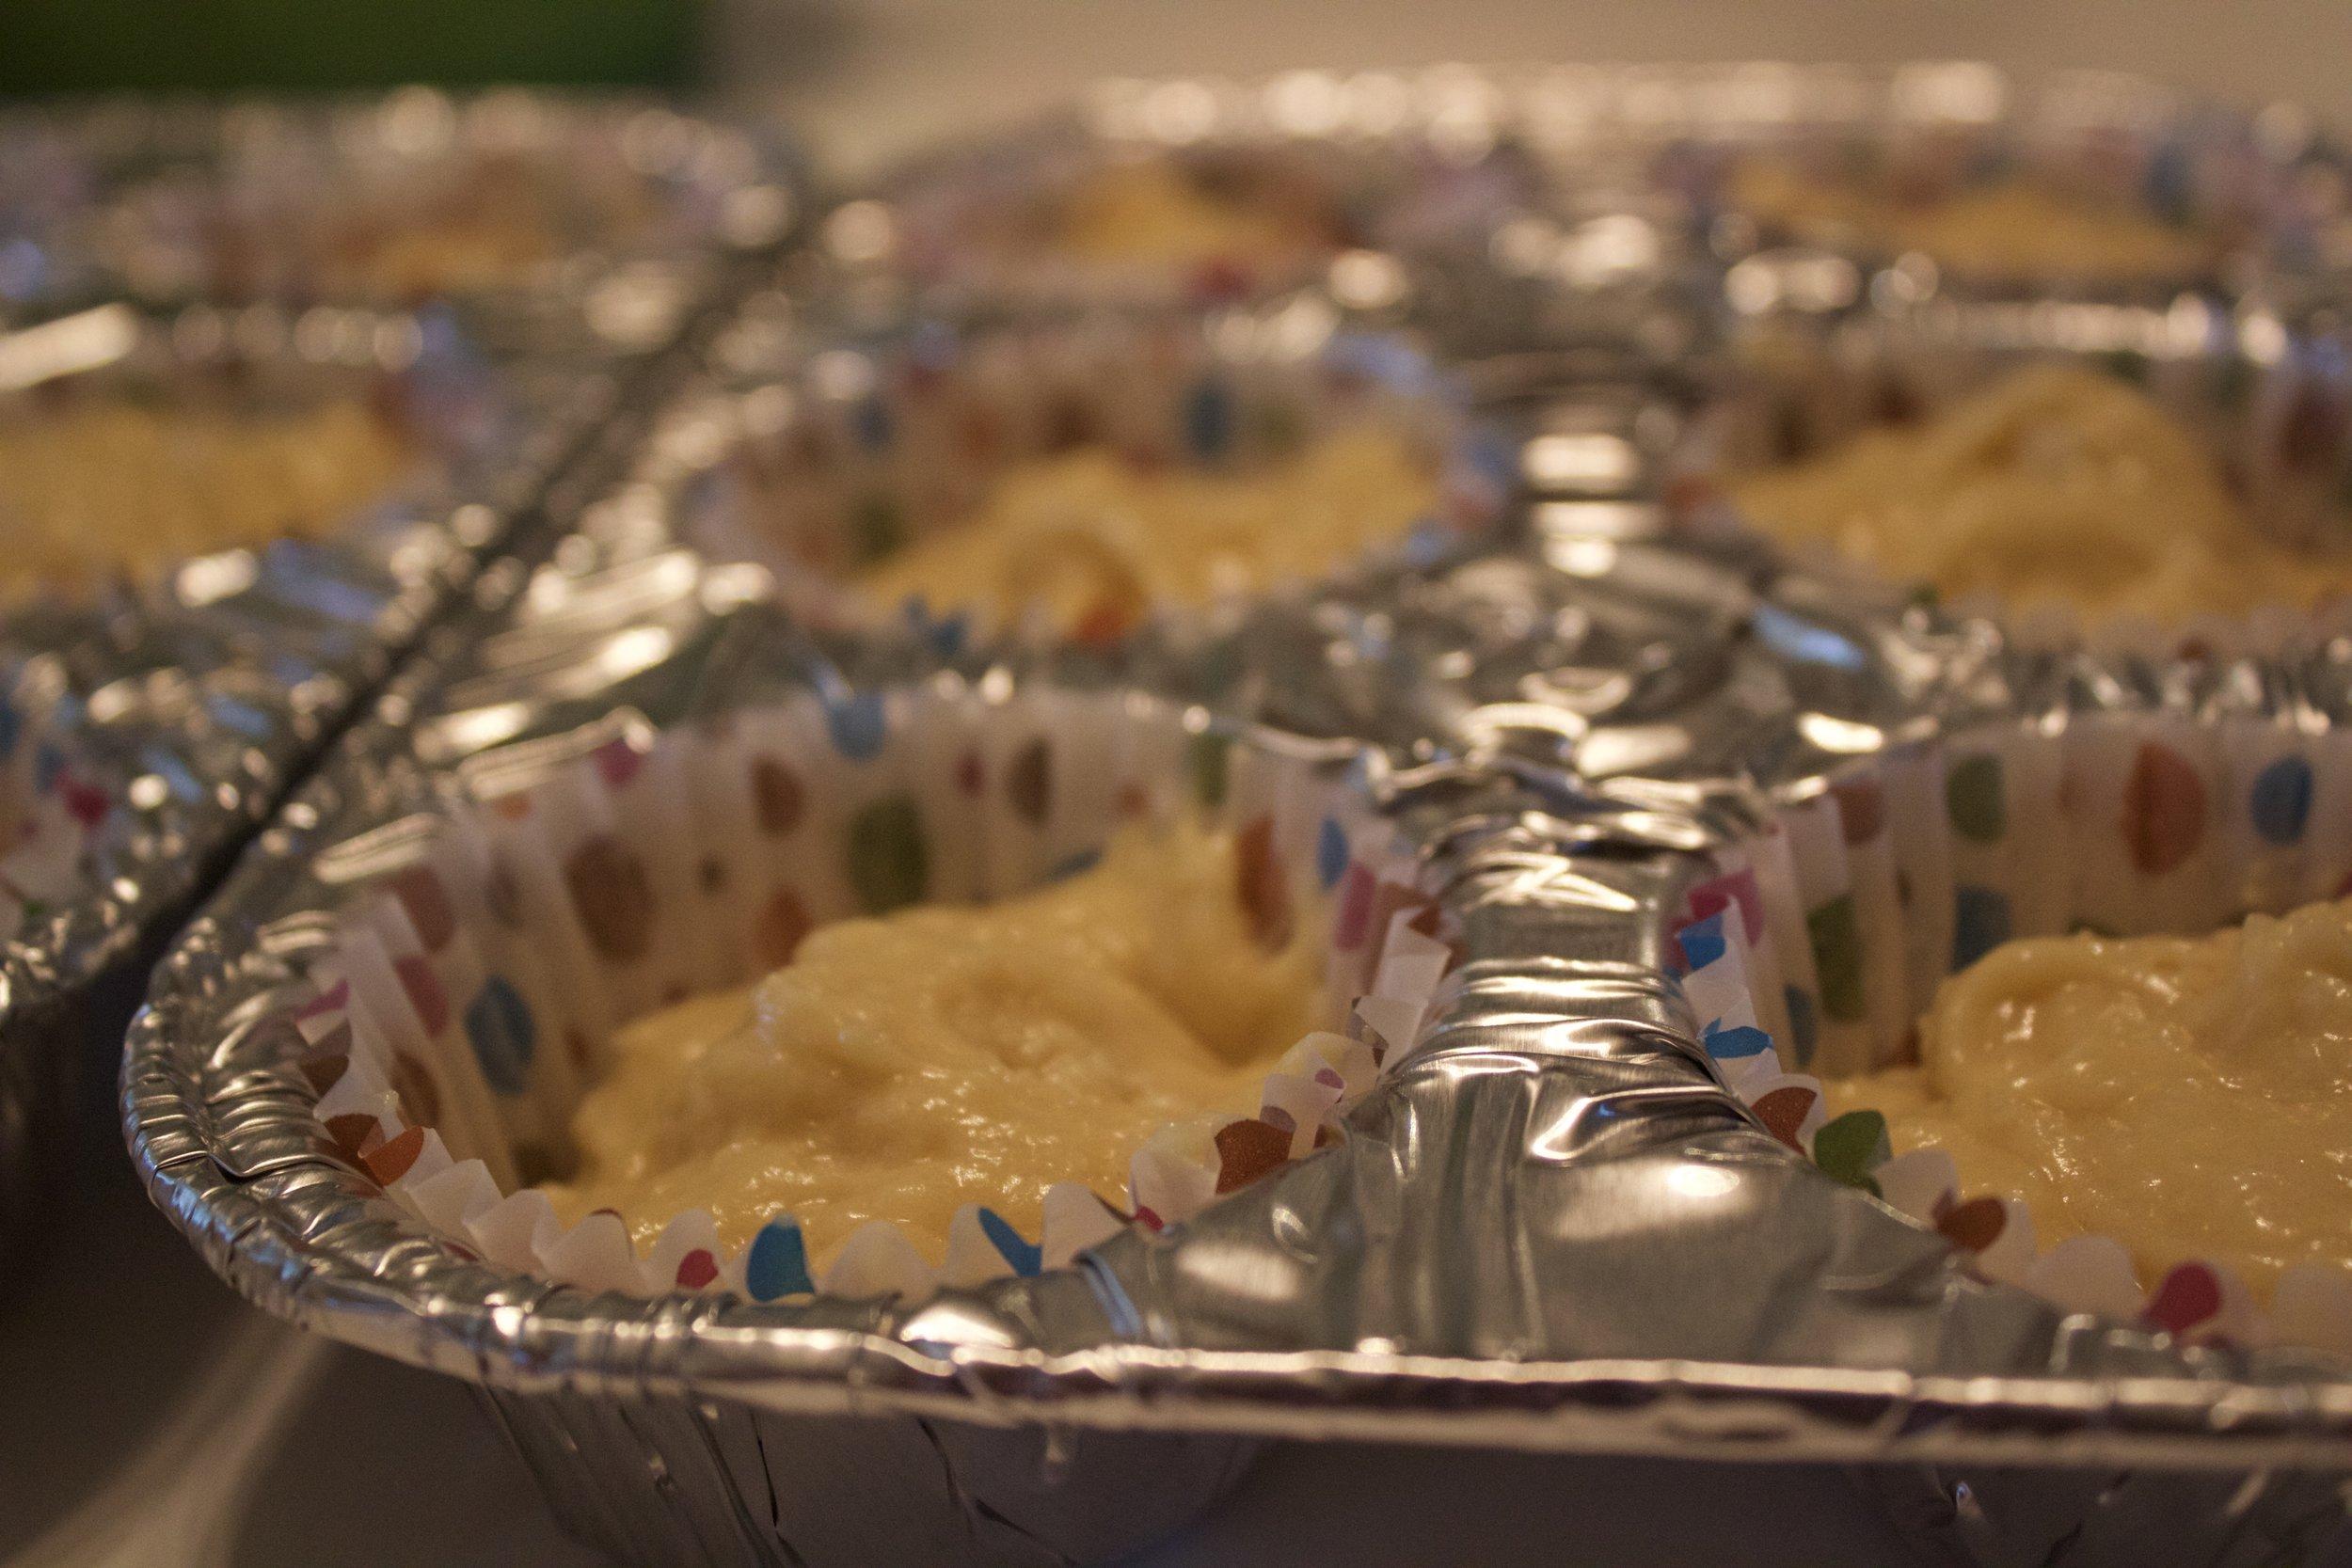 bake my pretties, bake!